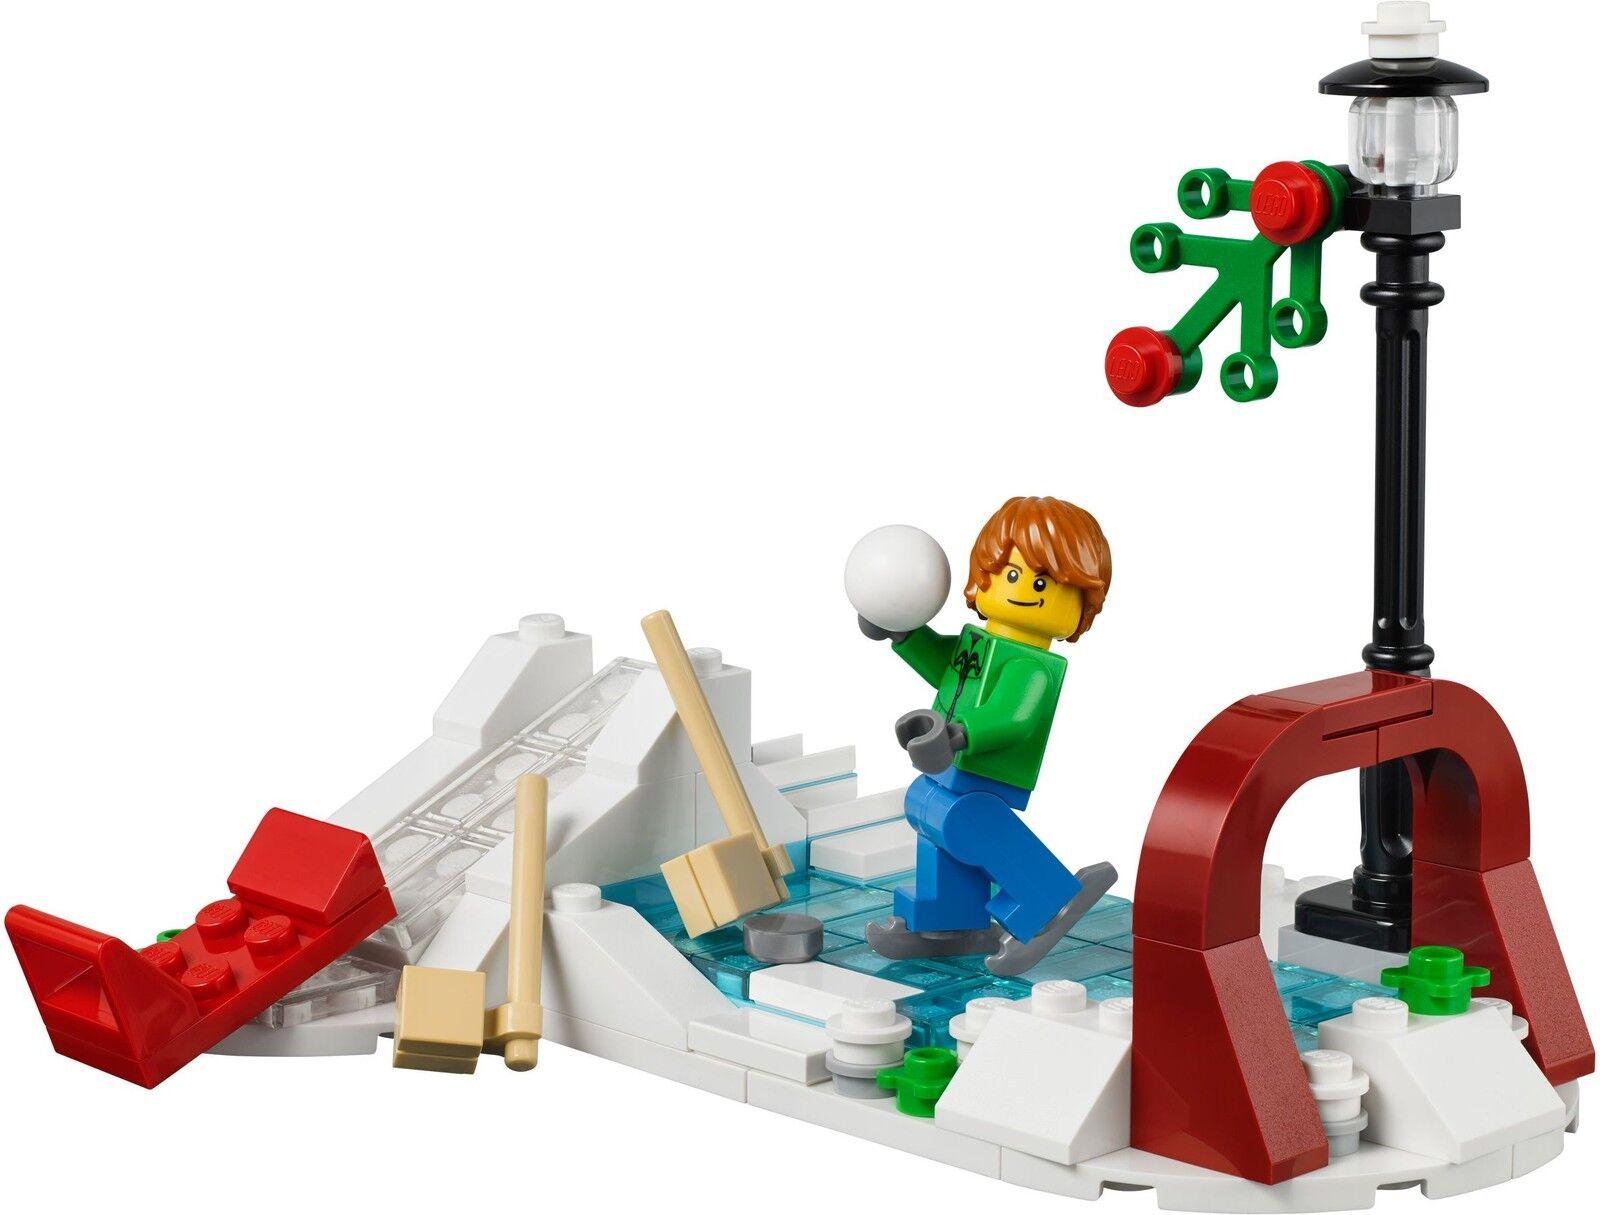 LEGO® Creator 40107 Winterliches Winterliches Winterliches Schlittschuh Set NEU_Winter Skating Scene 40106 b06ff6